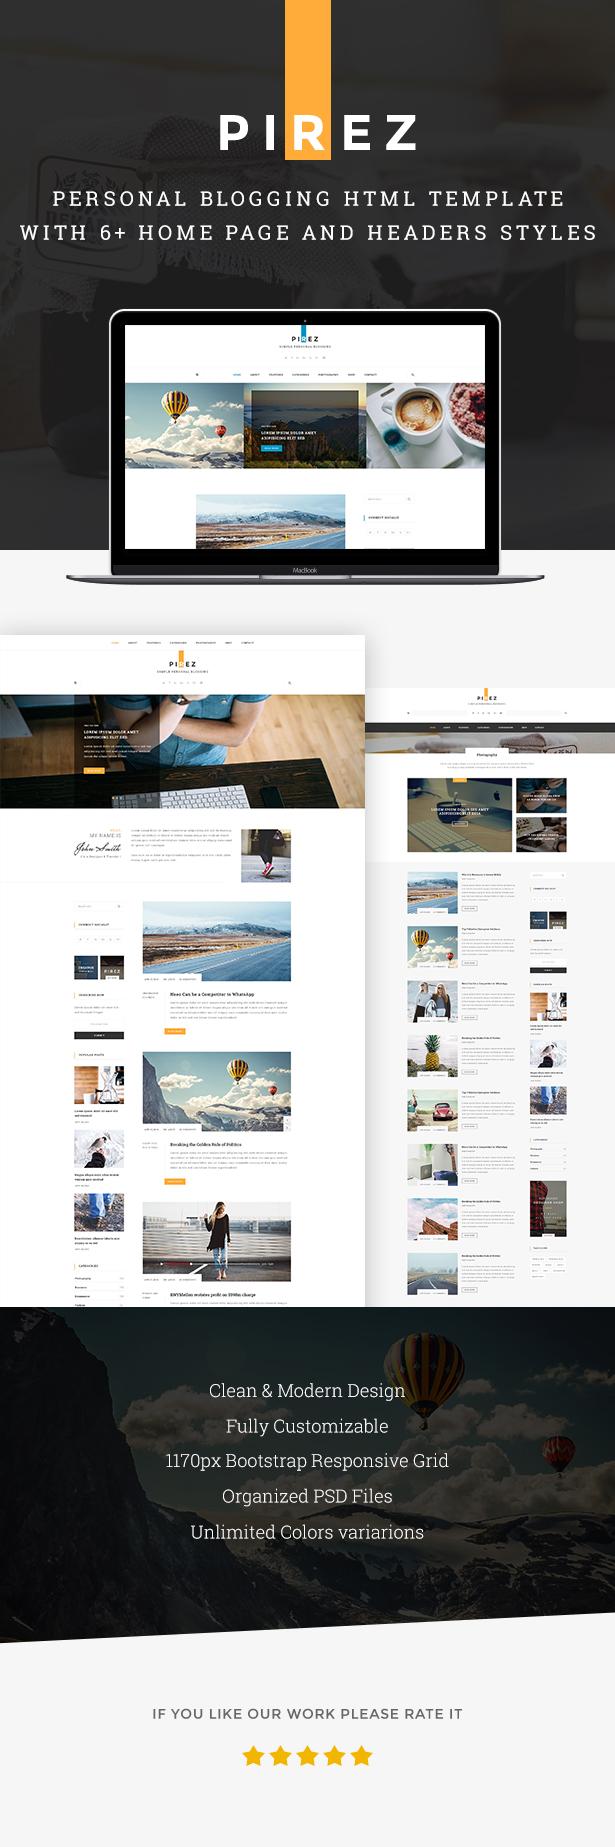 PIREZ - Blogging HTML Template by Pixity | ThemeForest